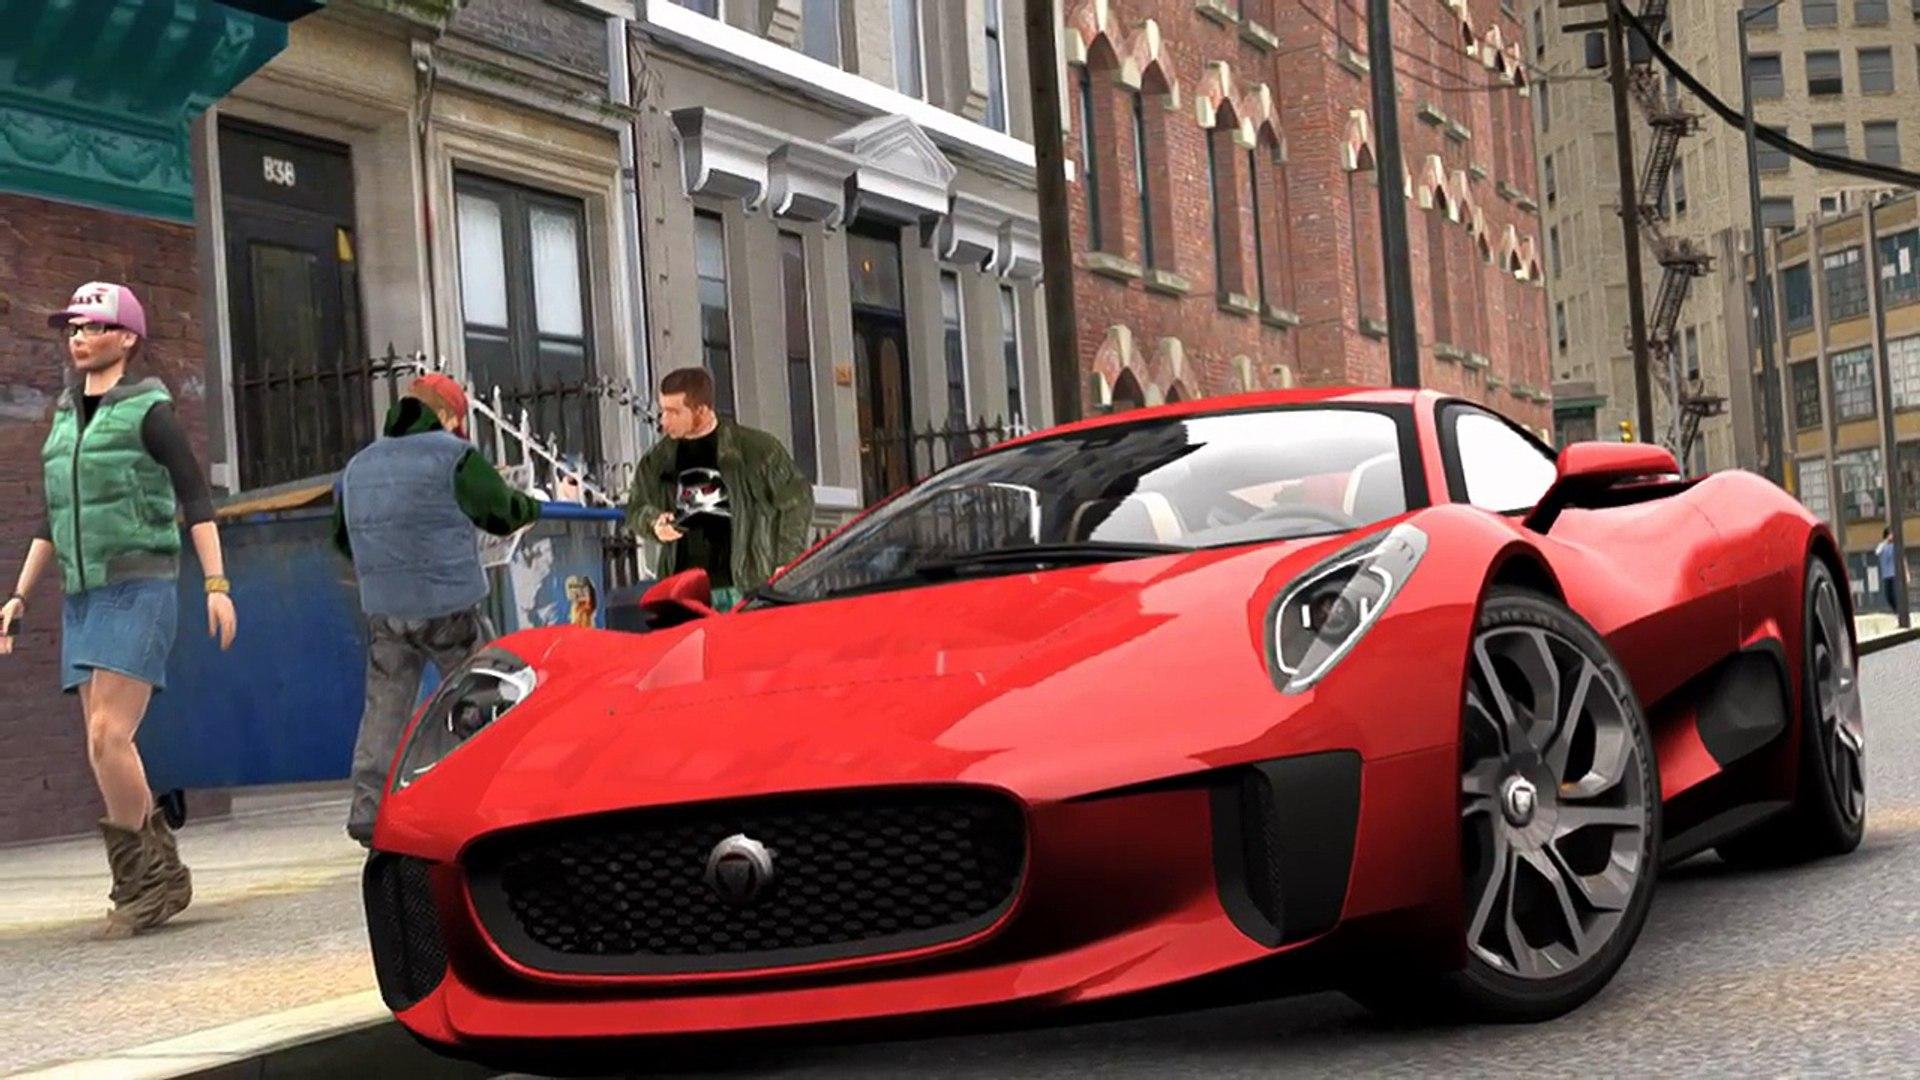 2015 Jaguar C X75 James Bond Villain Car From Spectre